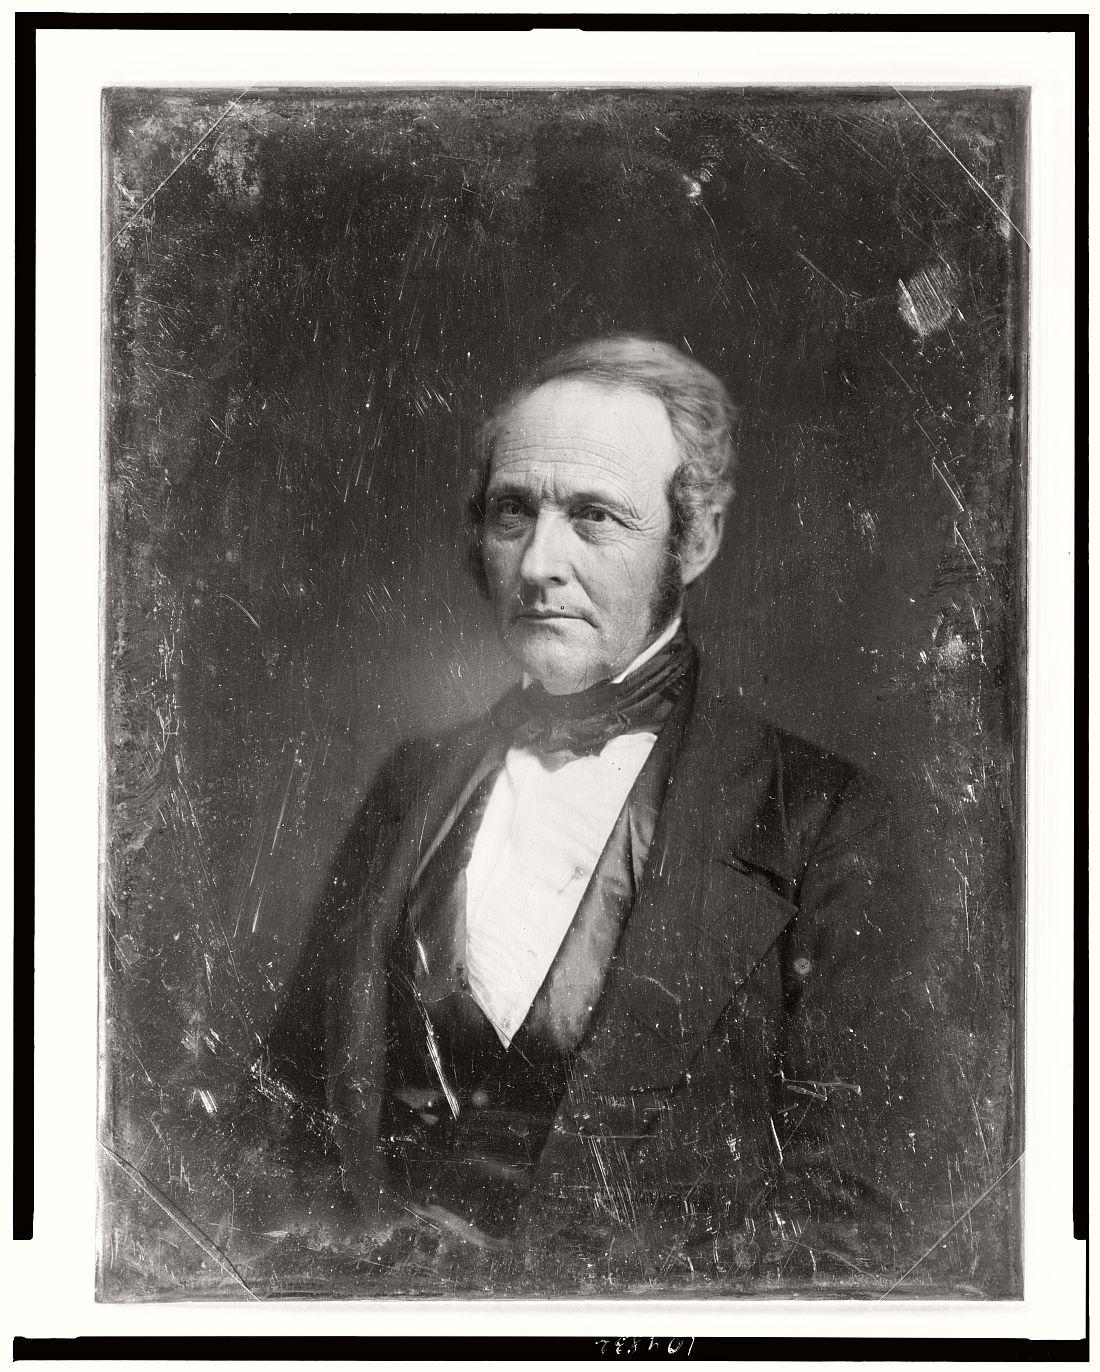 vintage-daguerreotype-portraits-from-xix-century-1844-1860-02